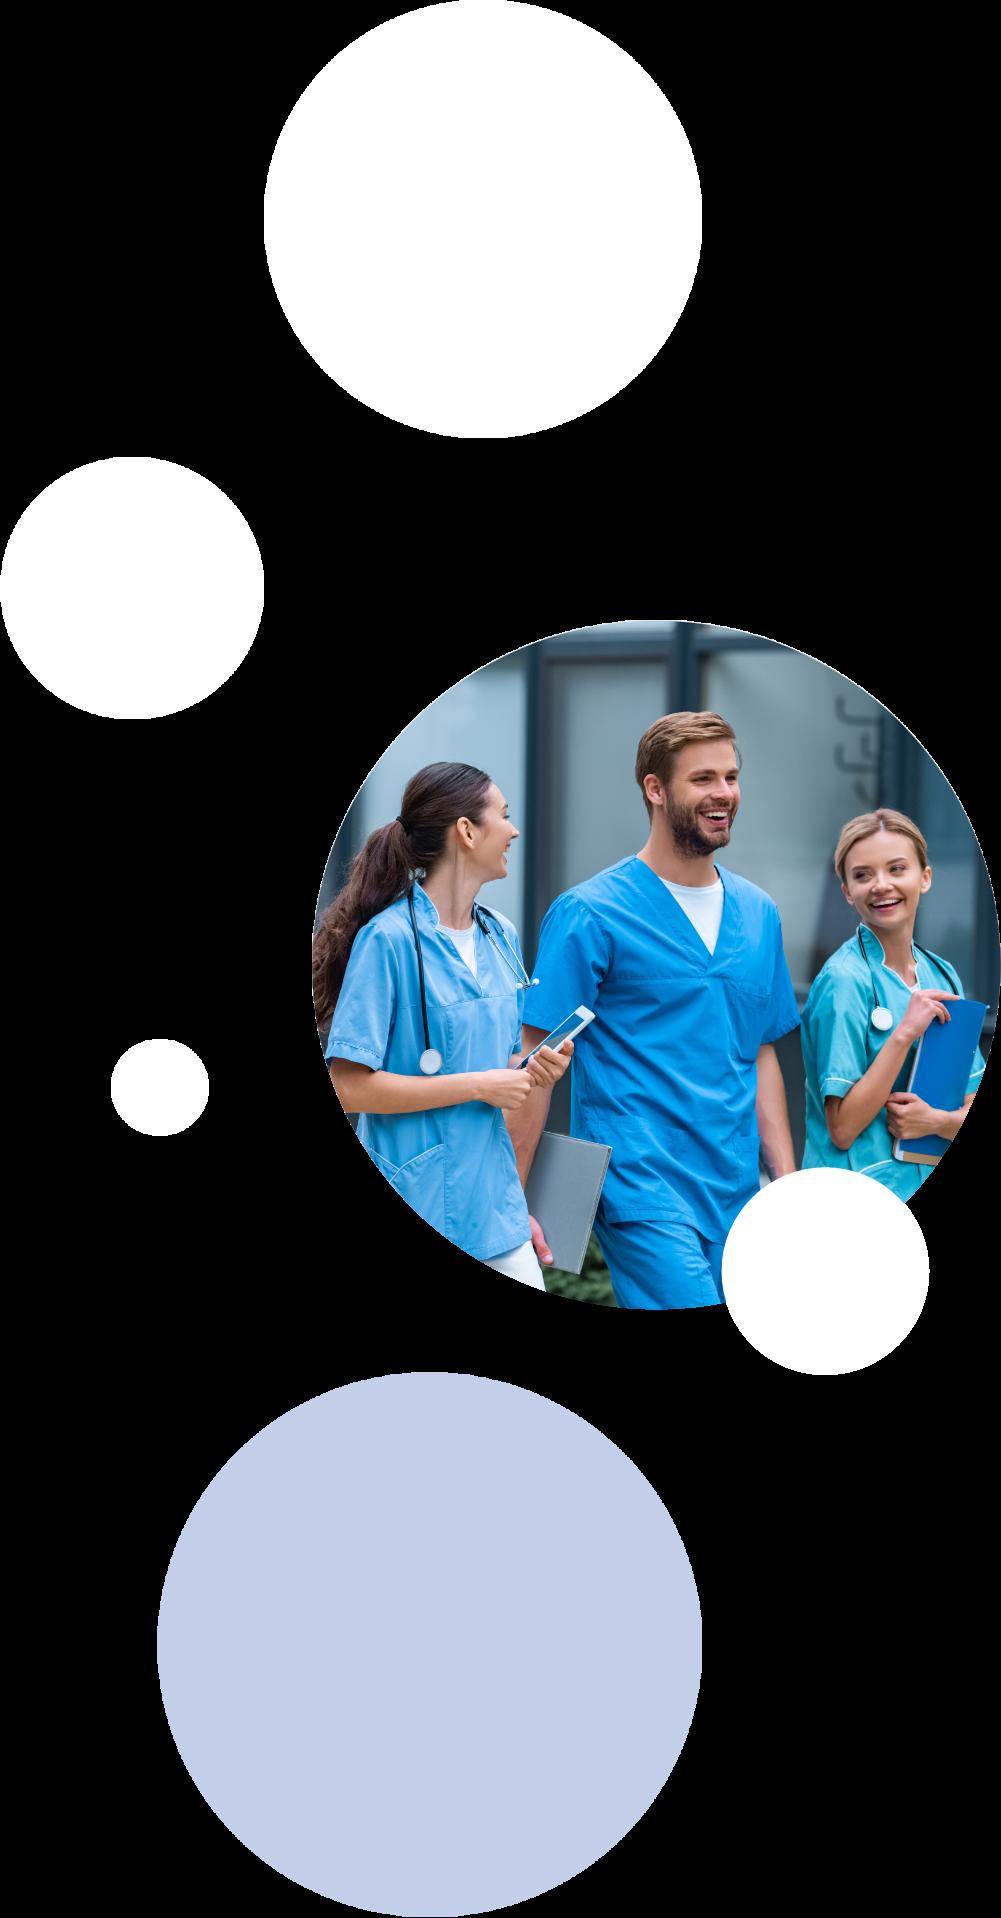 medical residency application help